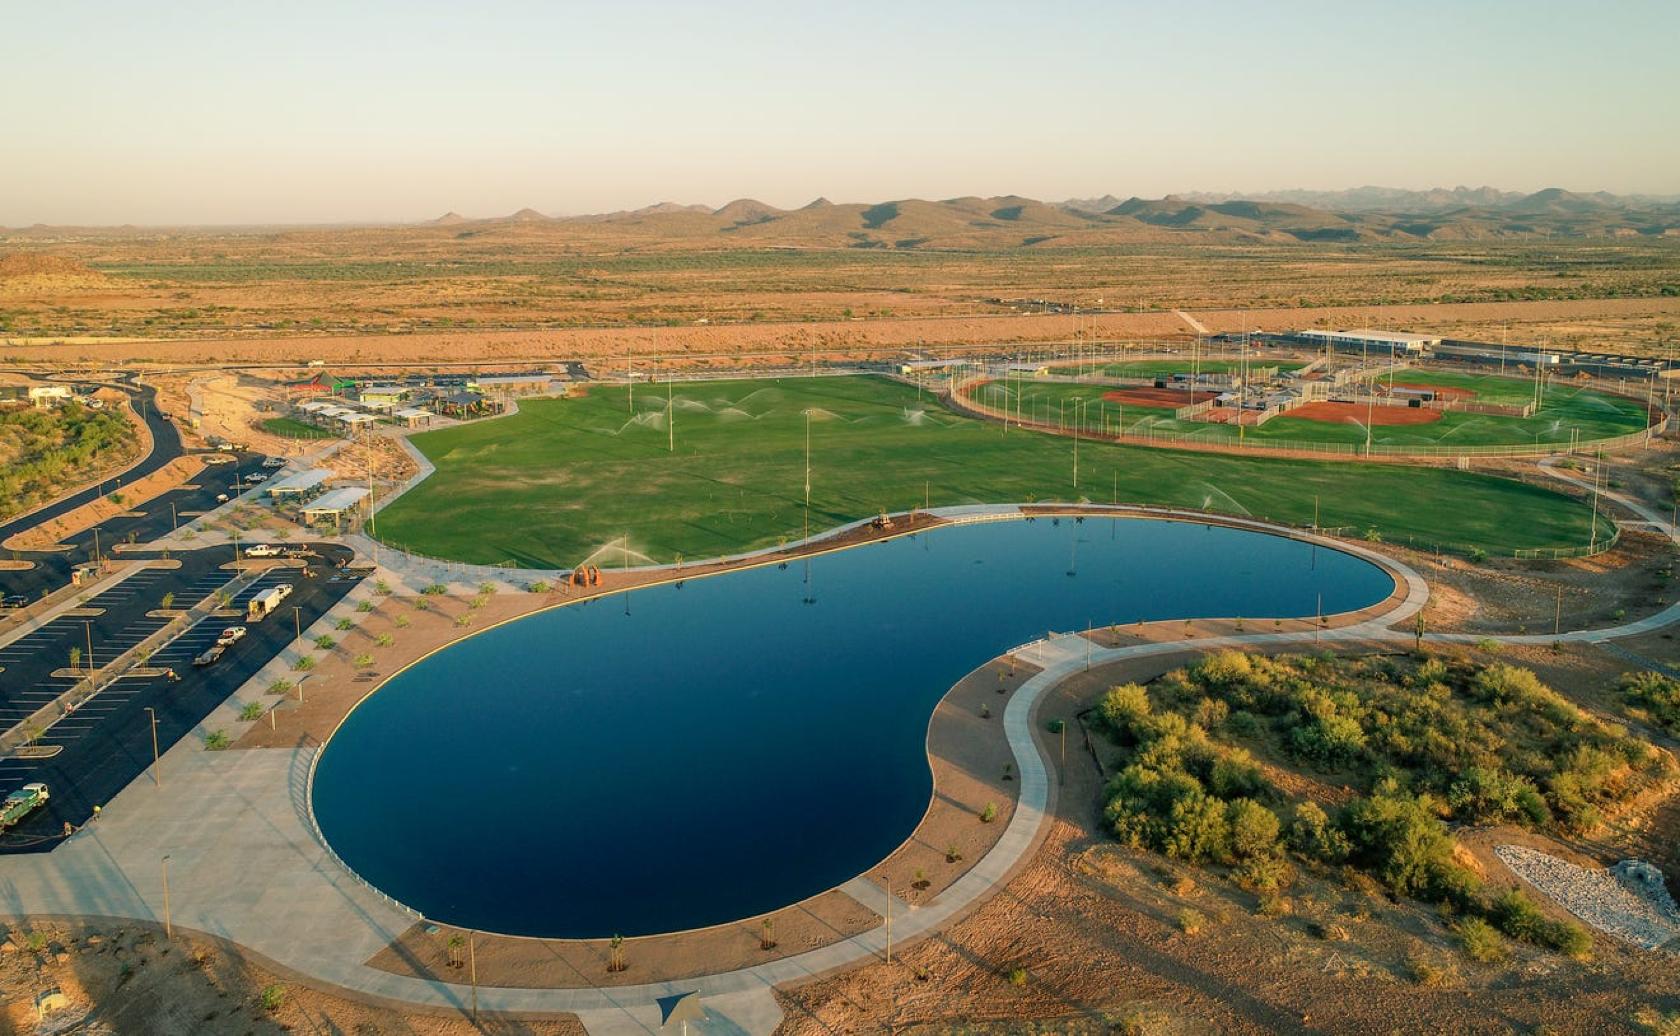 Paloma-Community-Lake-Fishing-Guide-Peoria-AZ-01